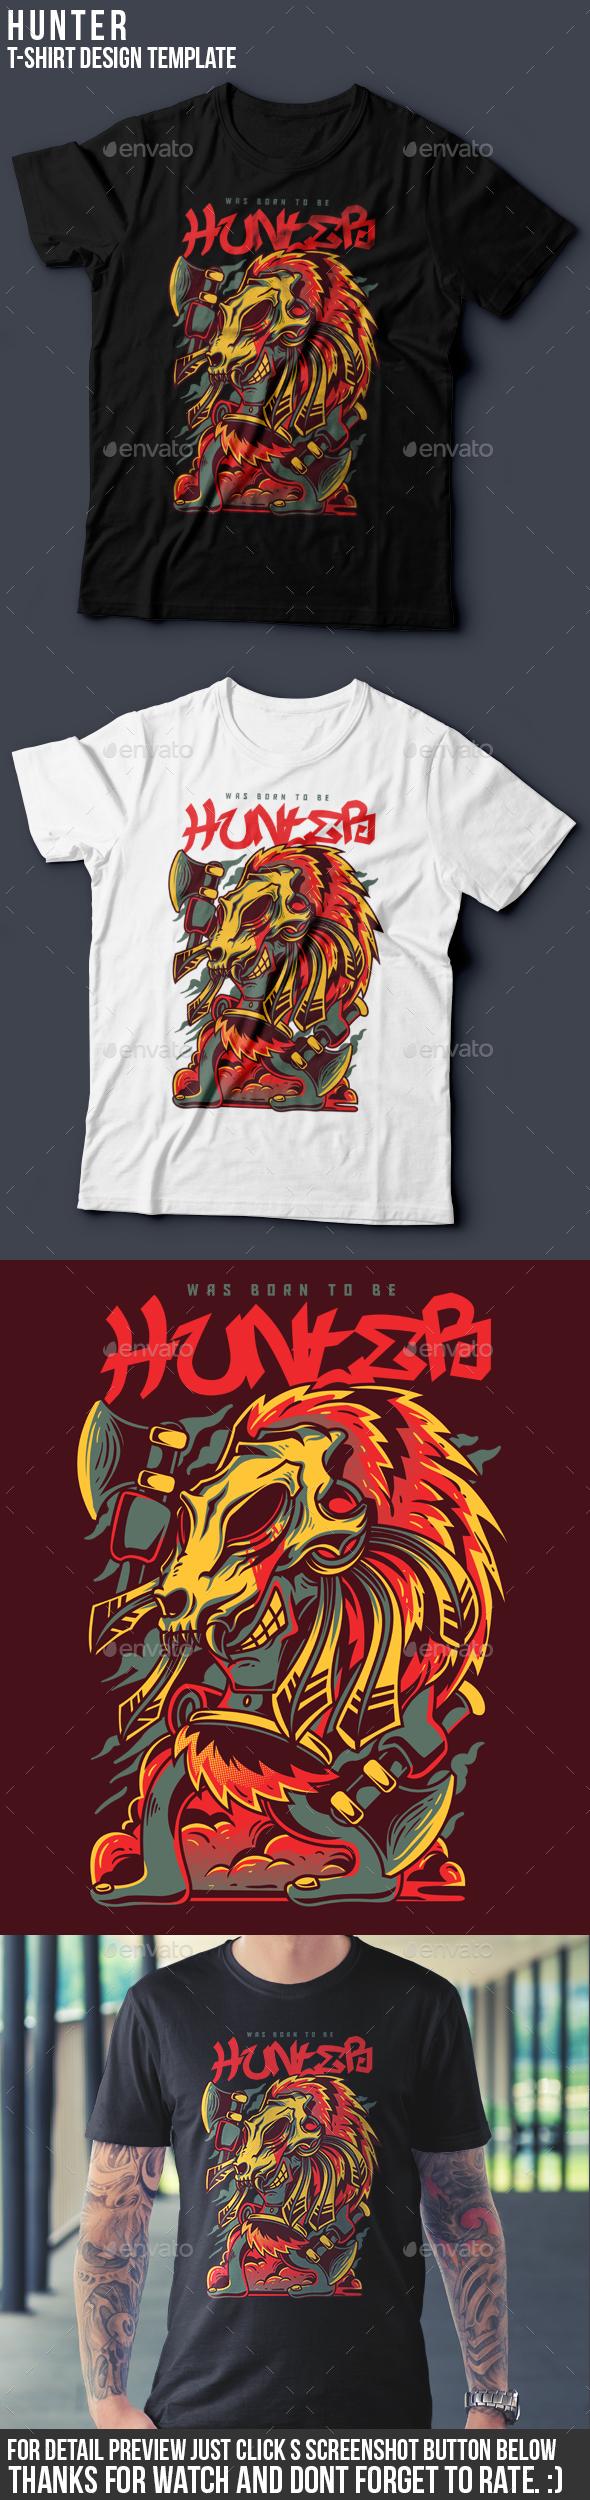 Hunter T-Shirt Design - Clean Designs